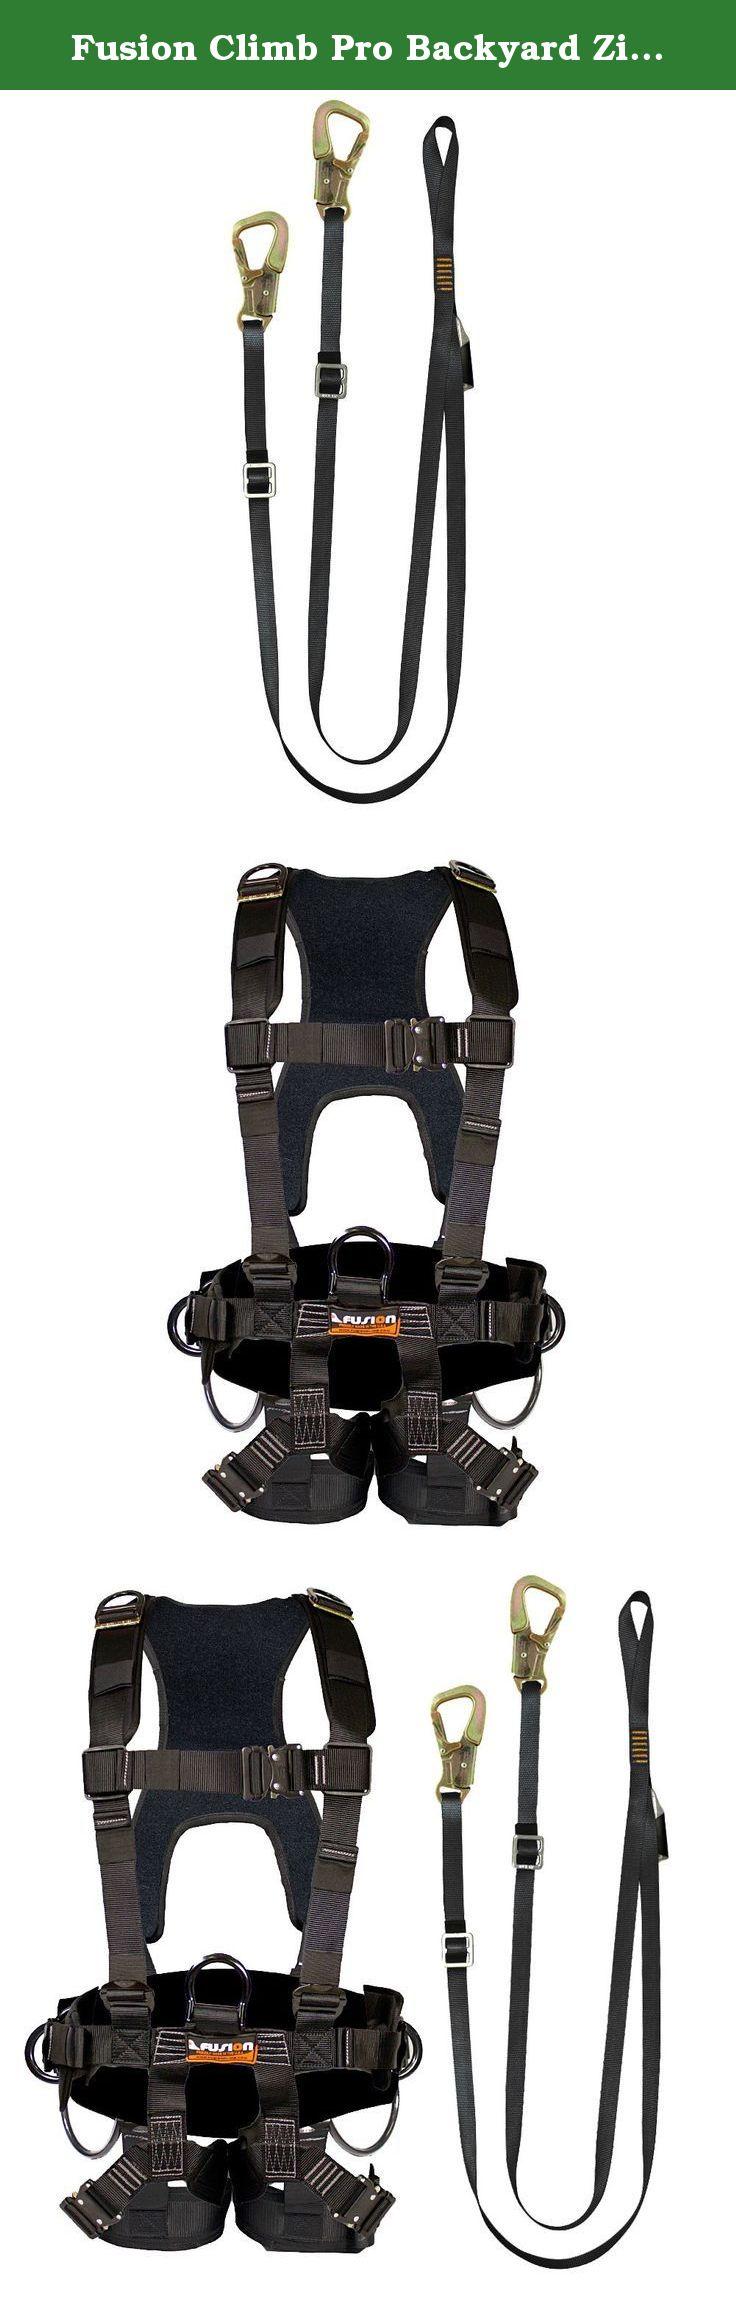 fusion climb pro backyard zip fk a hl 12 line kit harness lanyard